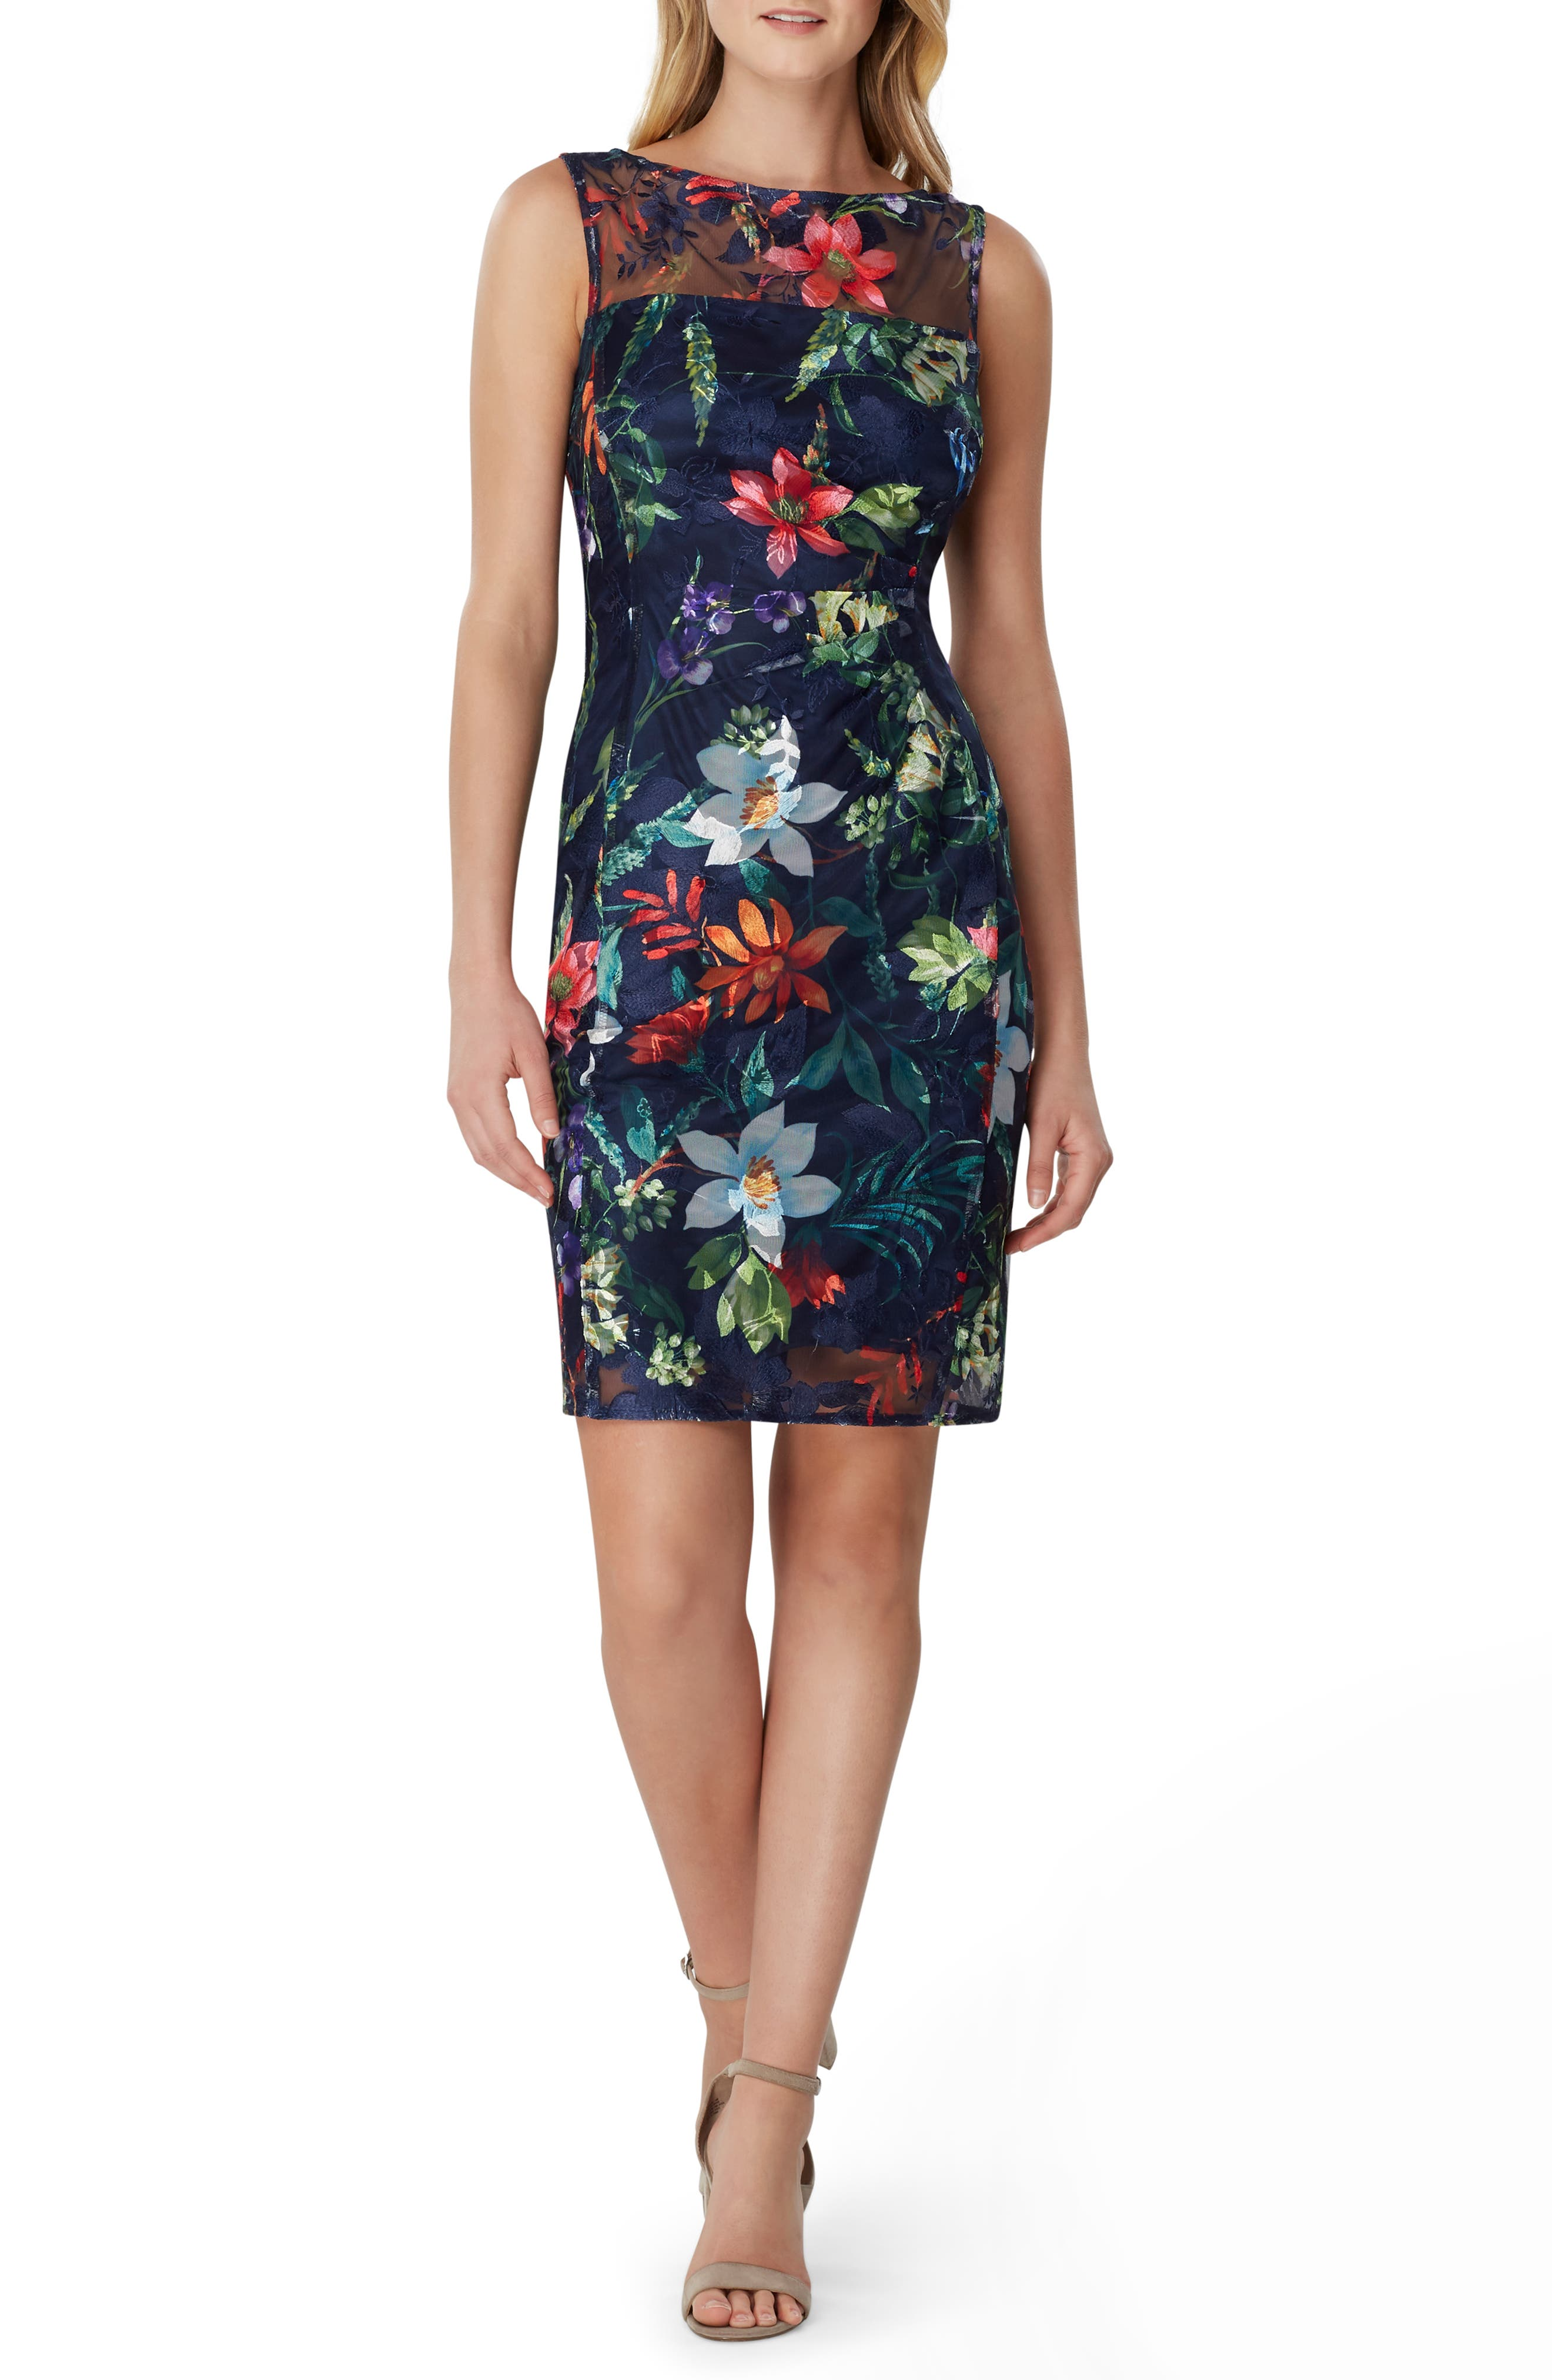 Tahari Sleeveless Floral Embroidered Sheath Dress, Blue